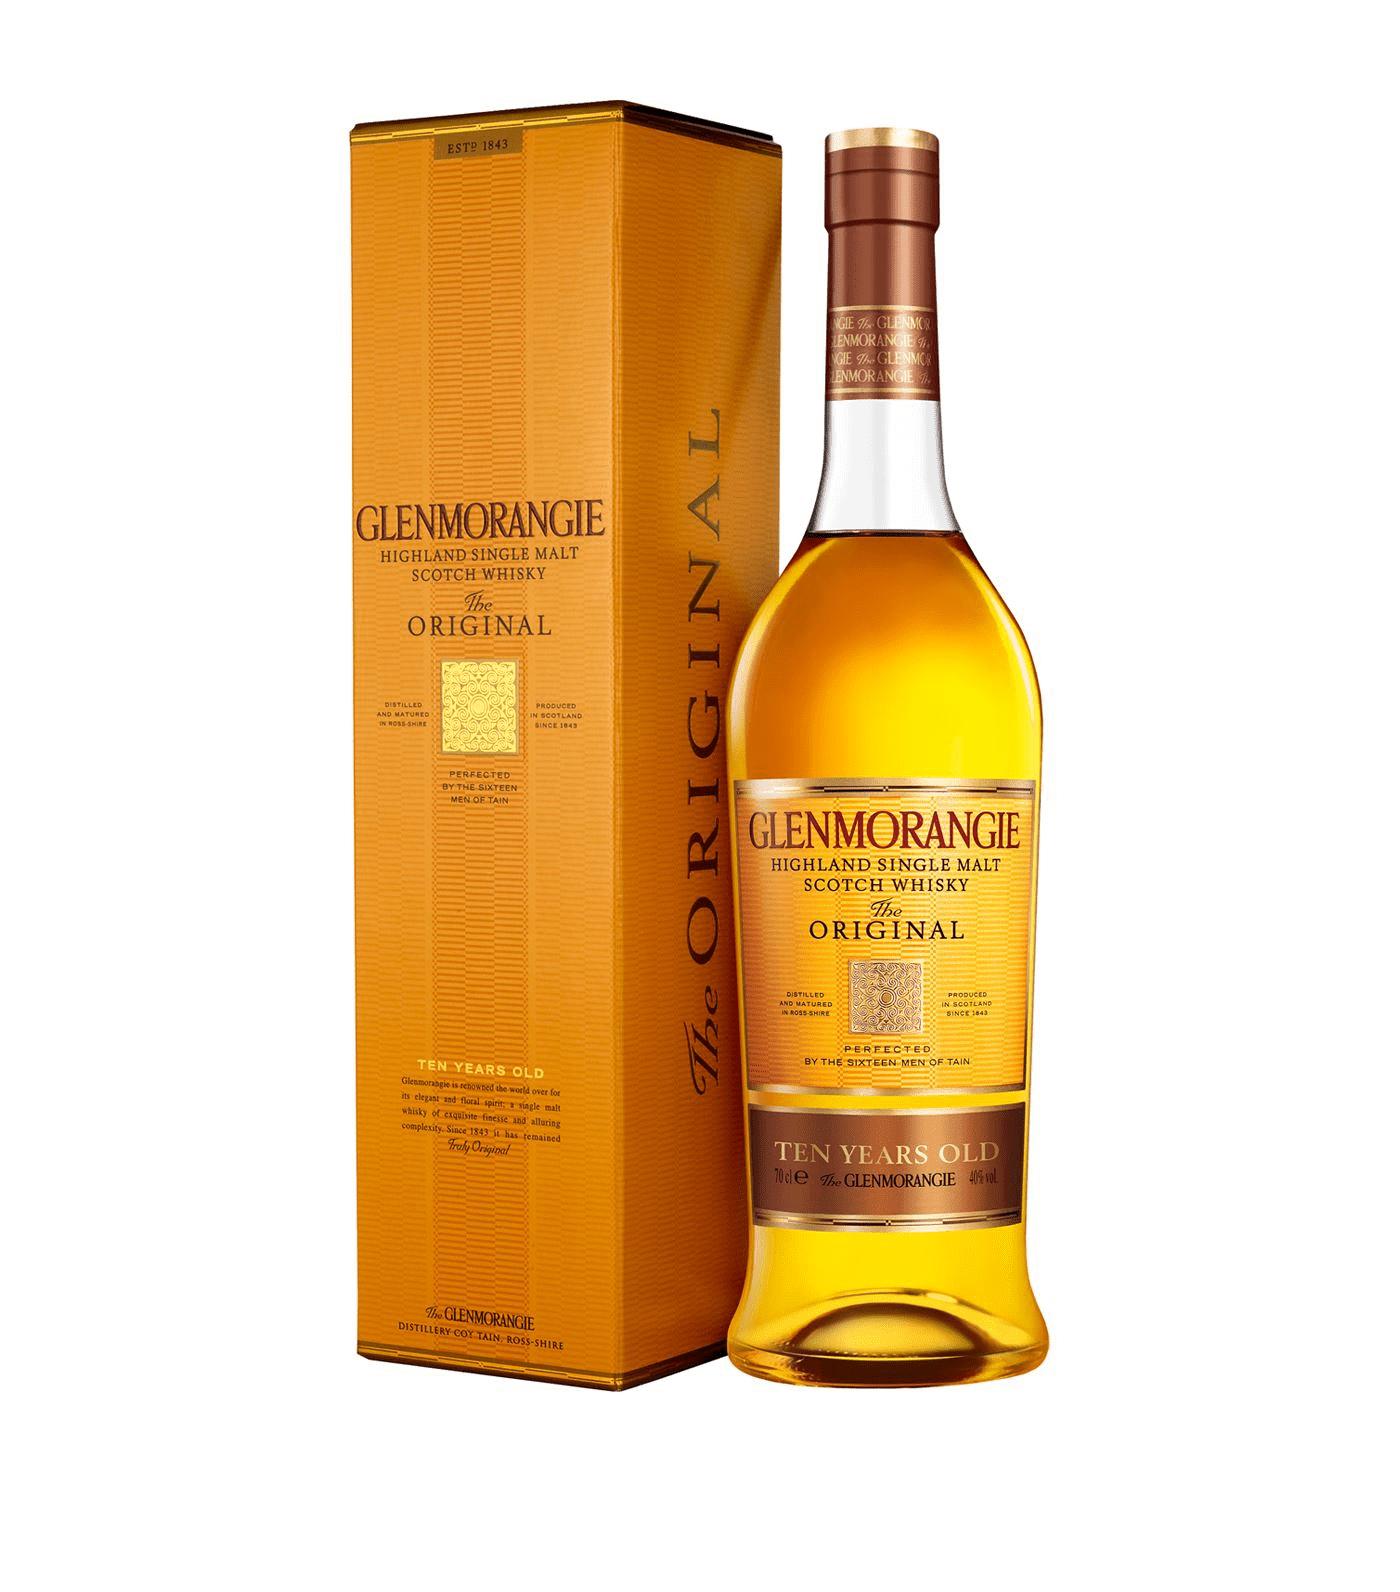 Glenmorangie The Original 10 Year Old Single Malt Scotch Whisky 70cl - £17.01 at Asda Portsmouth